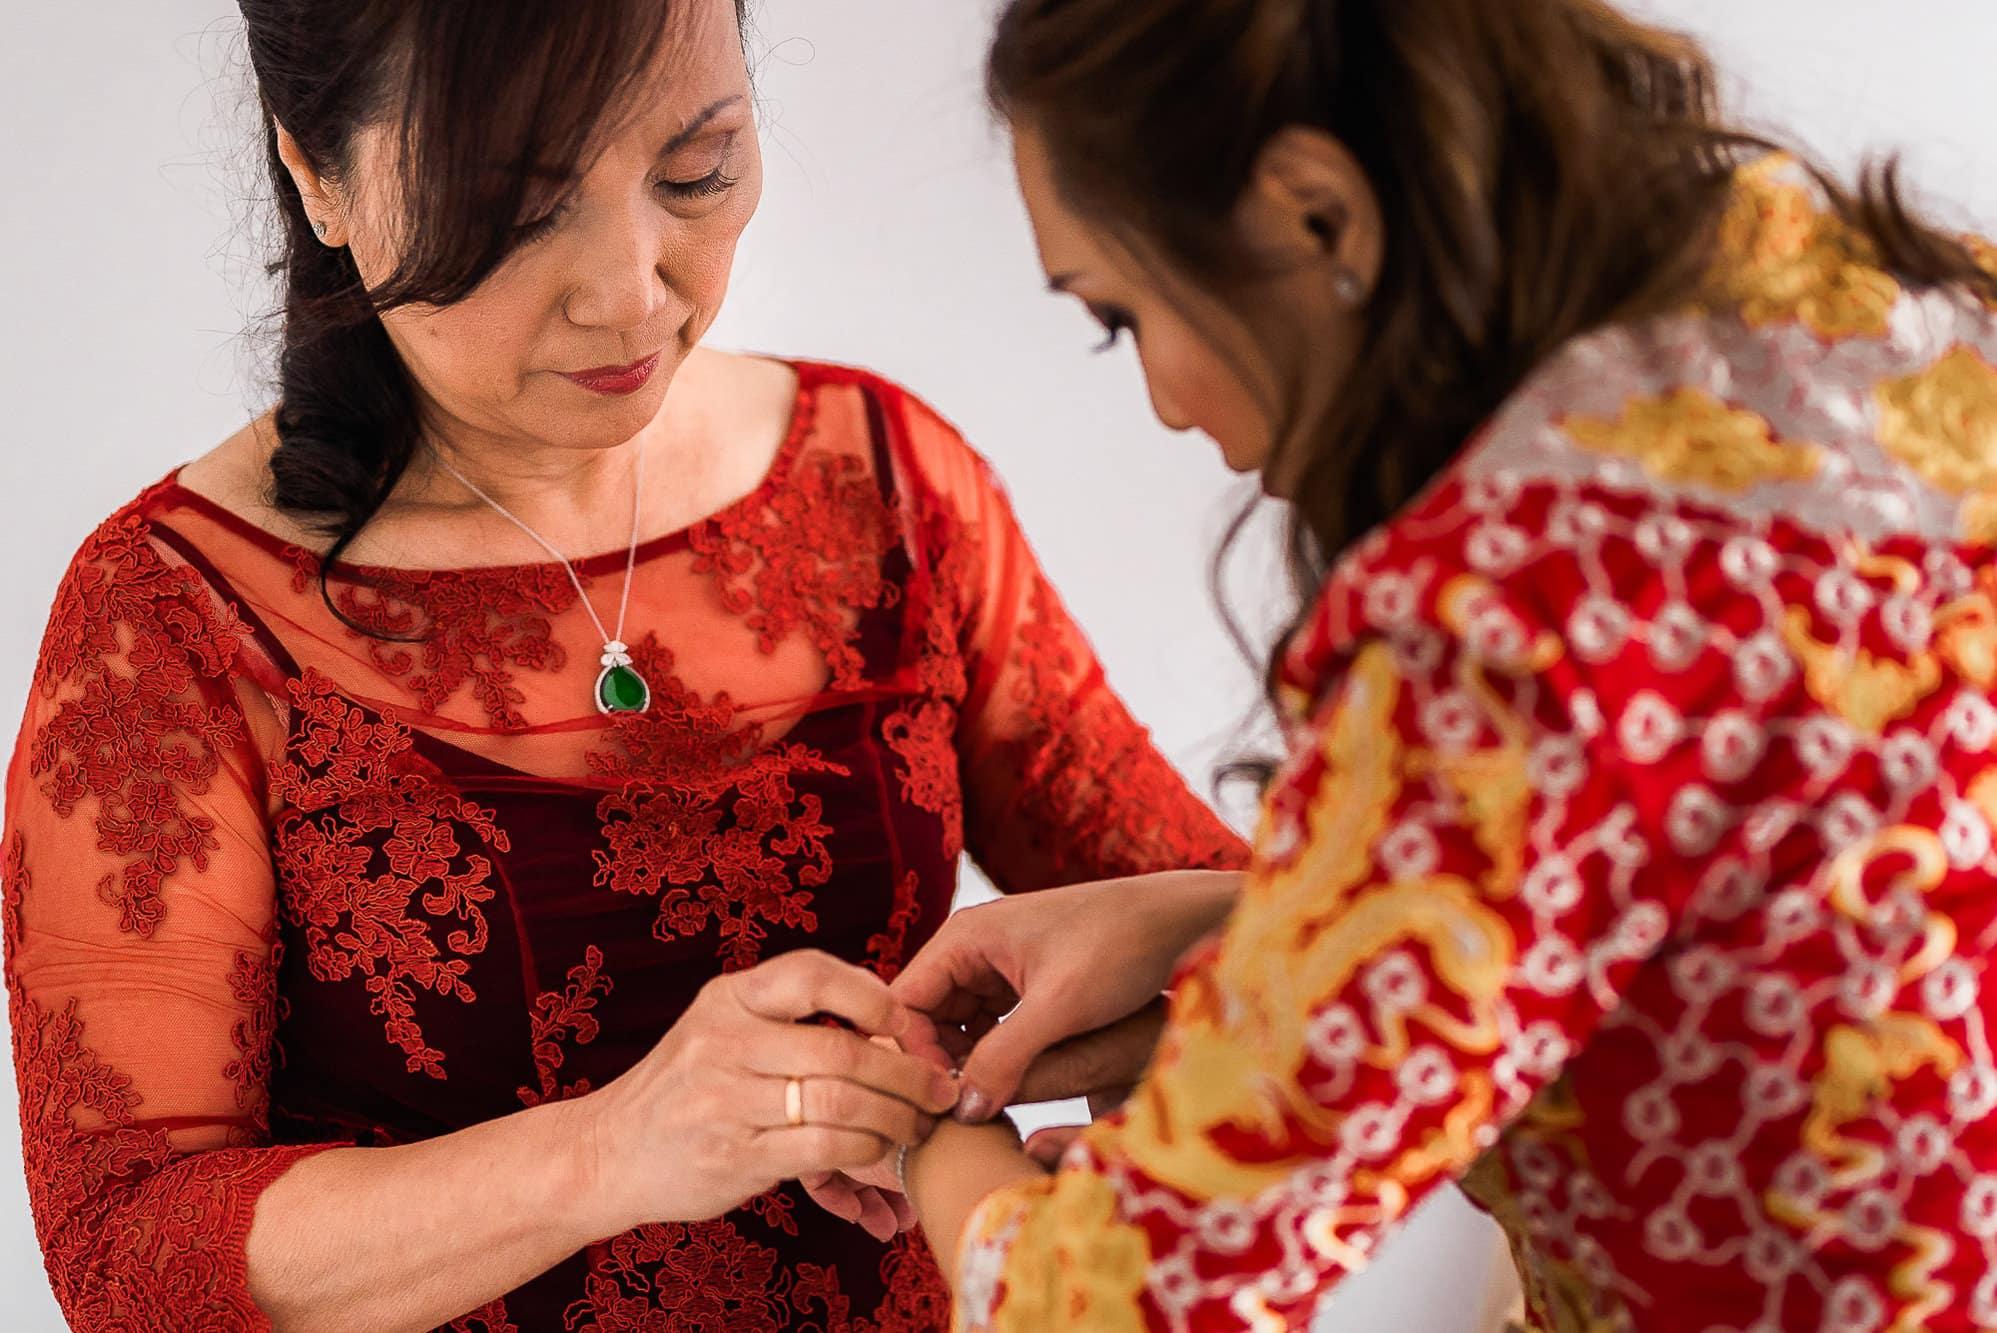 Mum helping bride into dress